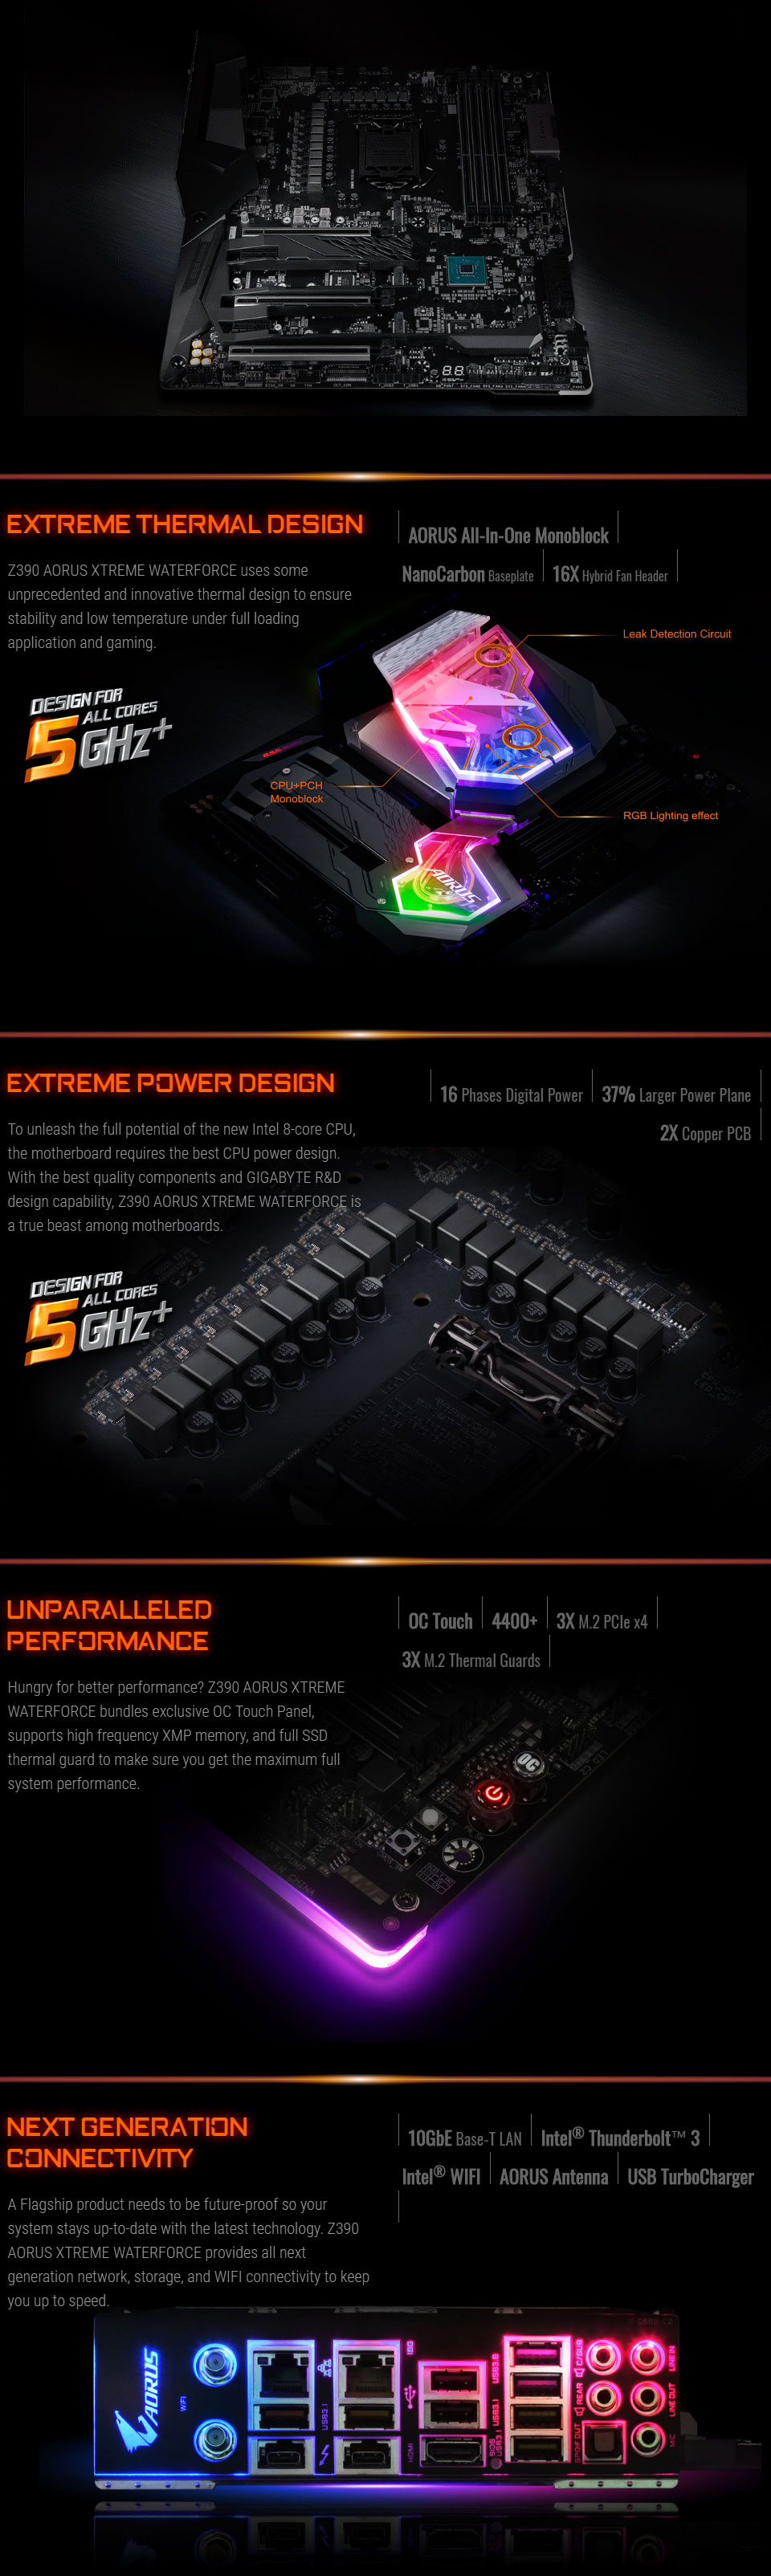 Gigabyte Z390 AORUS Xtreme Waterforce Motherboard [GA-Z390-AORUS